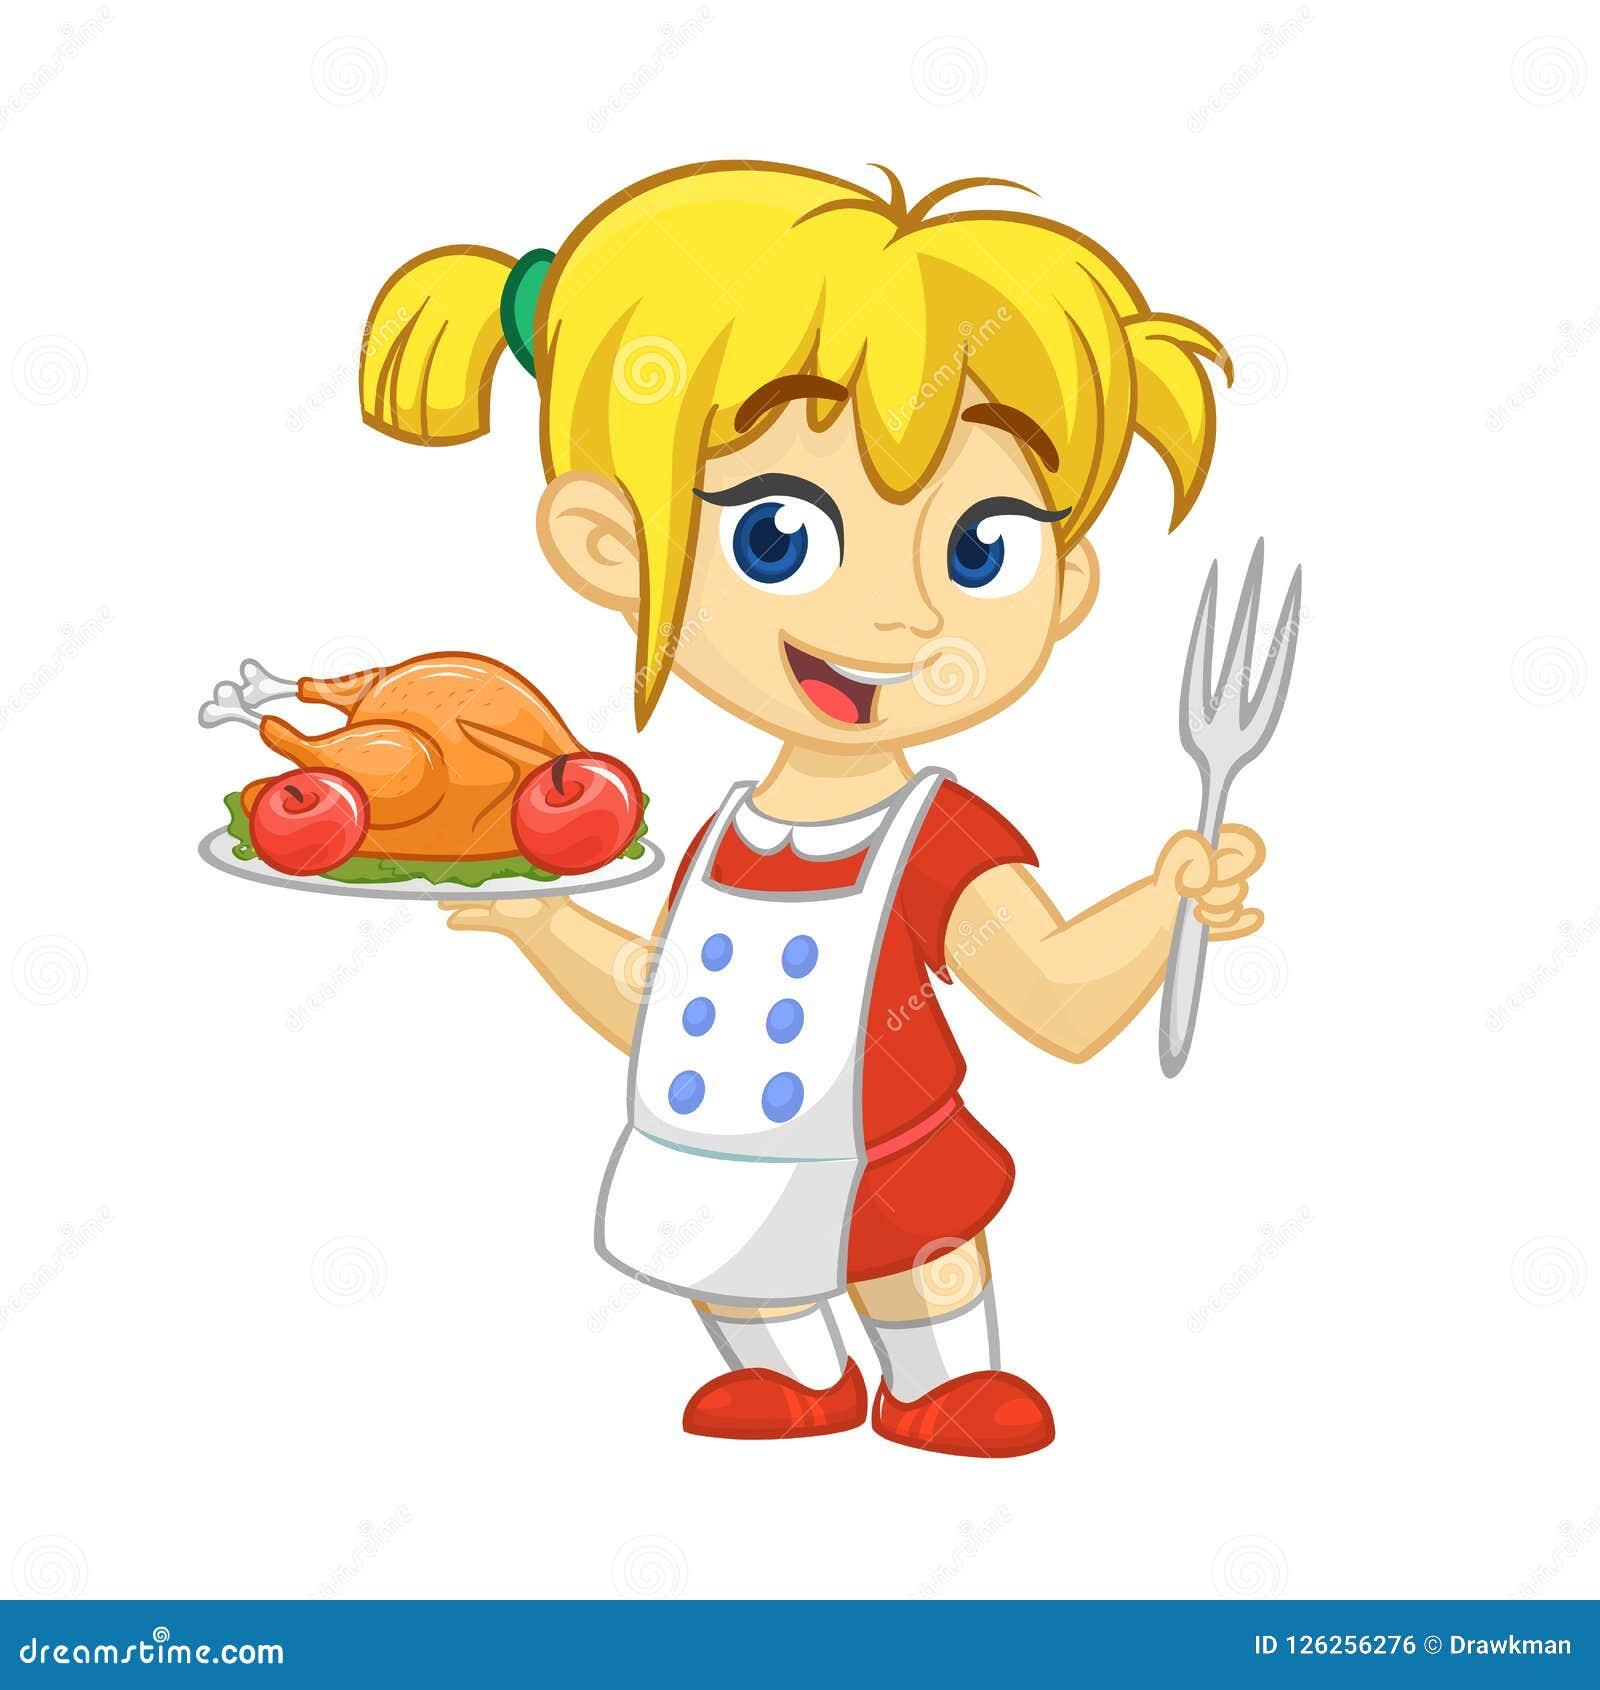 f7d0a7e321ac Κορίτσι κινούμενων σχεδίων που εξυπηρετεί το ψημένο πιάτο της Τουρκίας  ημέρας των ευχαριστιών Σχέδιο ημέρας των